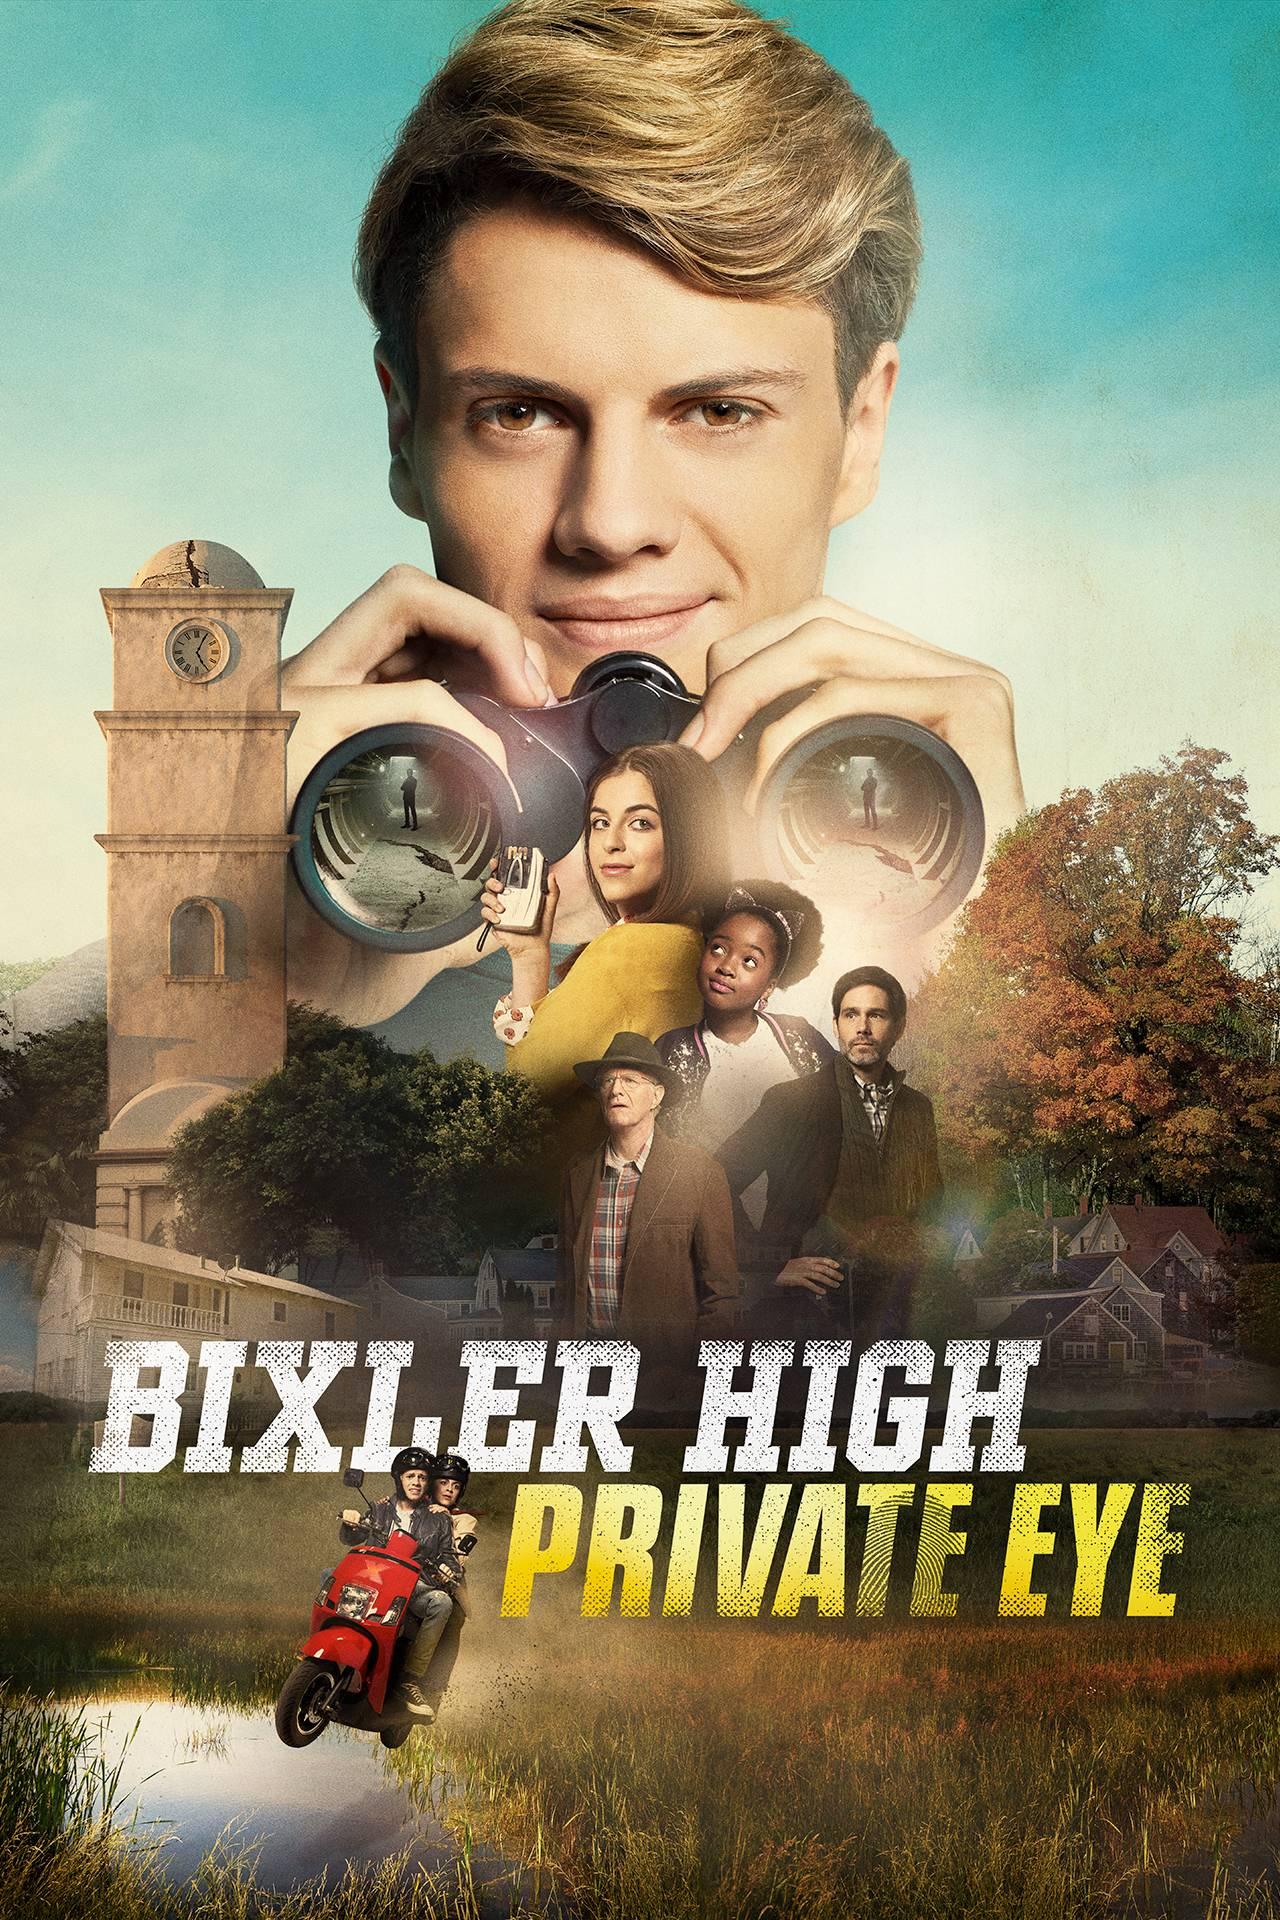 Bixler High Private Eye Official Tv Series Nickelodeon